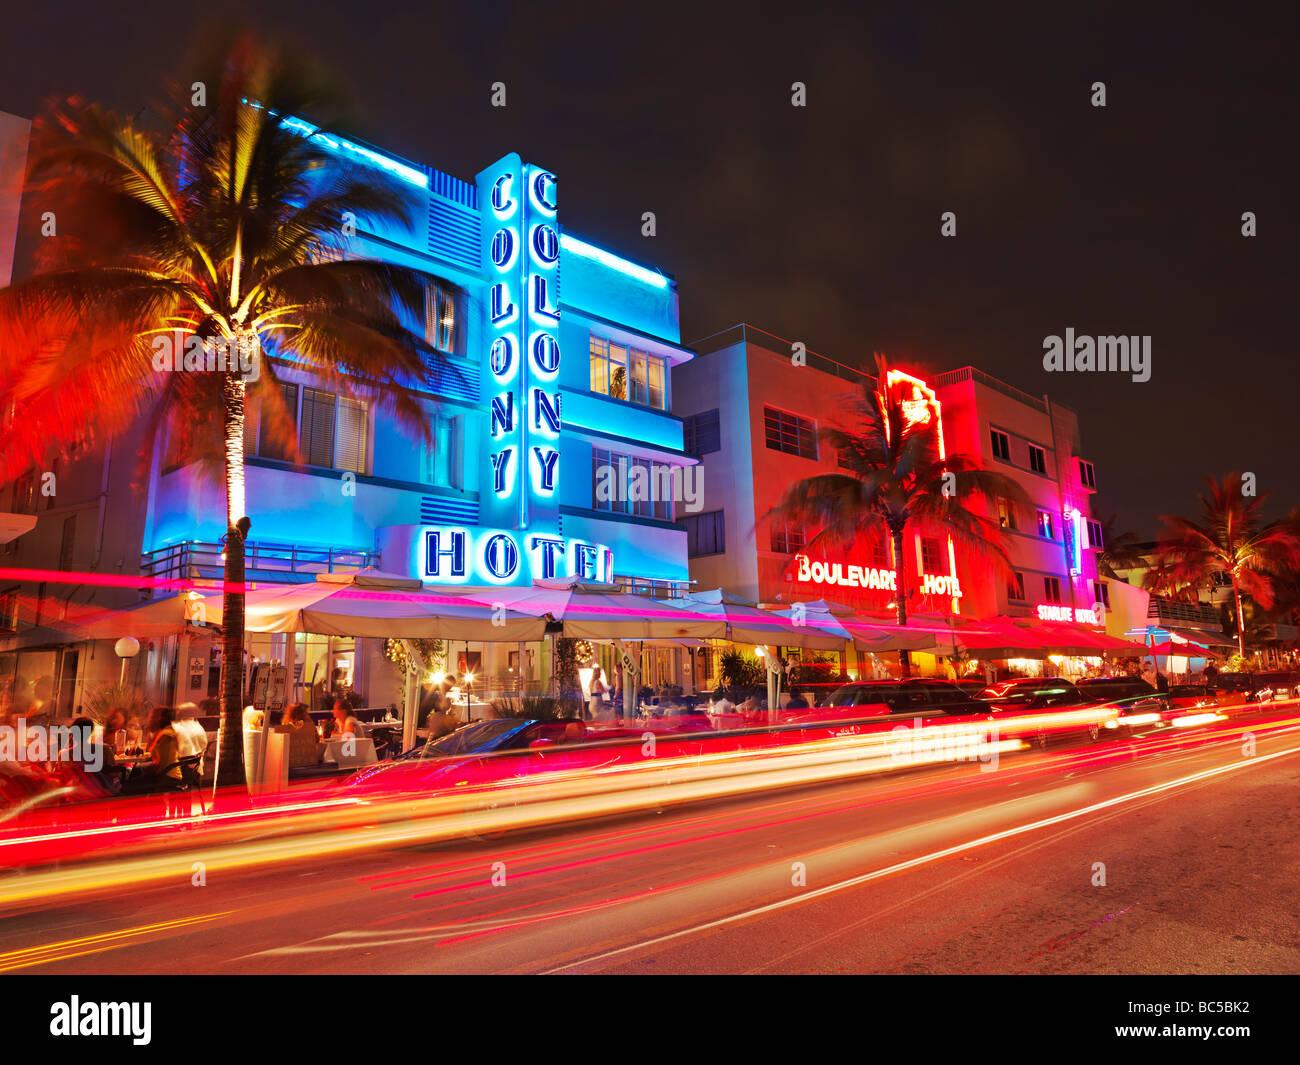 Usafloridasouth Beach Miamirestaurants At Night On Ocean Drive